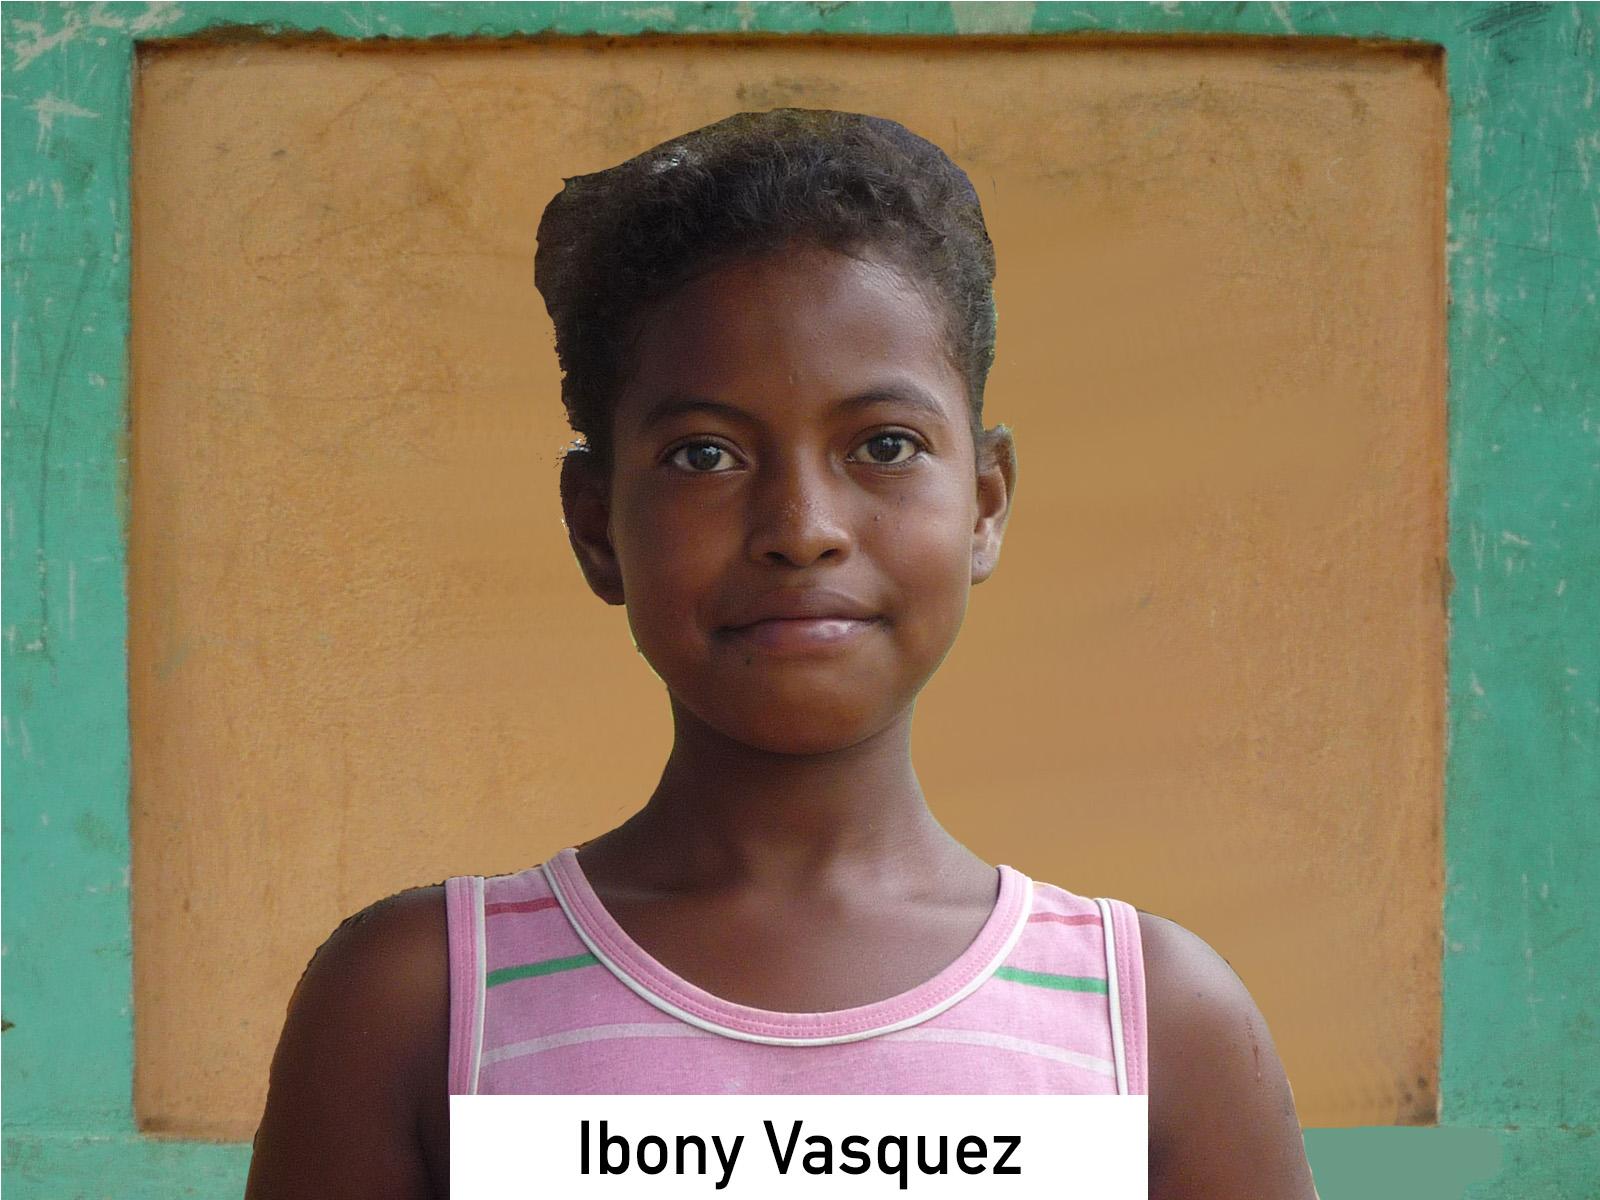 062 - Ibony Vasquez.jpg